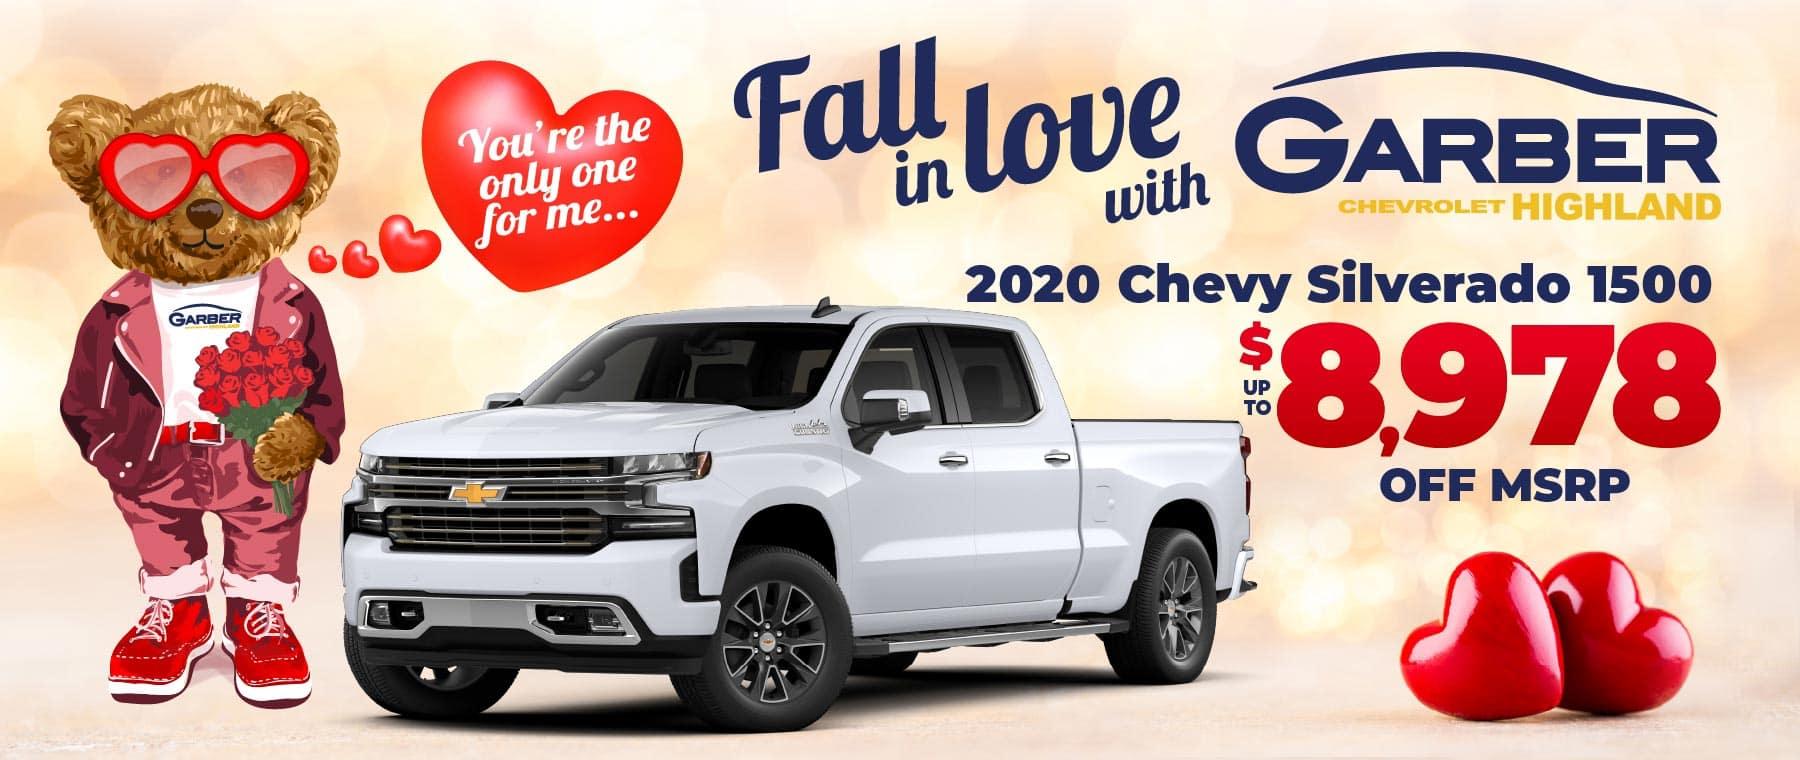 2020 Chevy Silverado 1500 - up to $8978 off MSRP